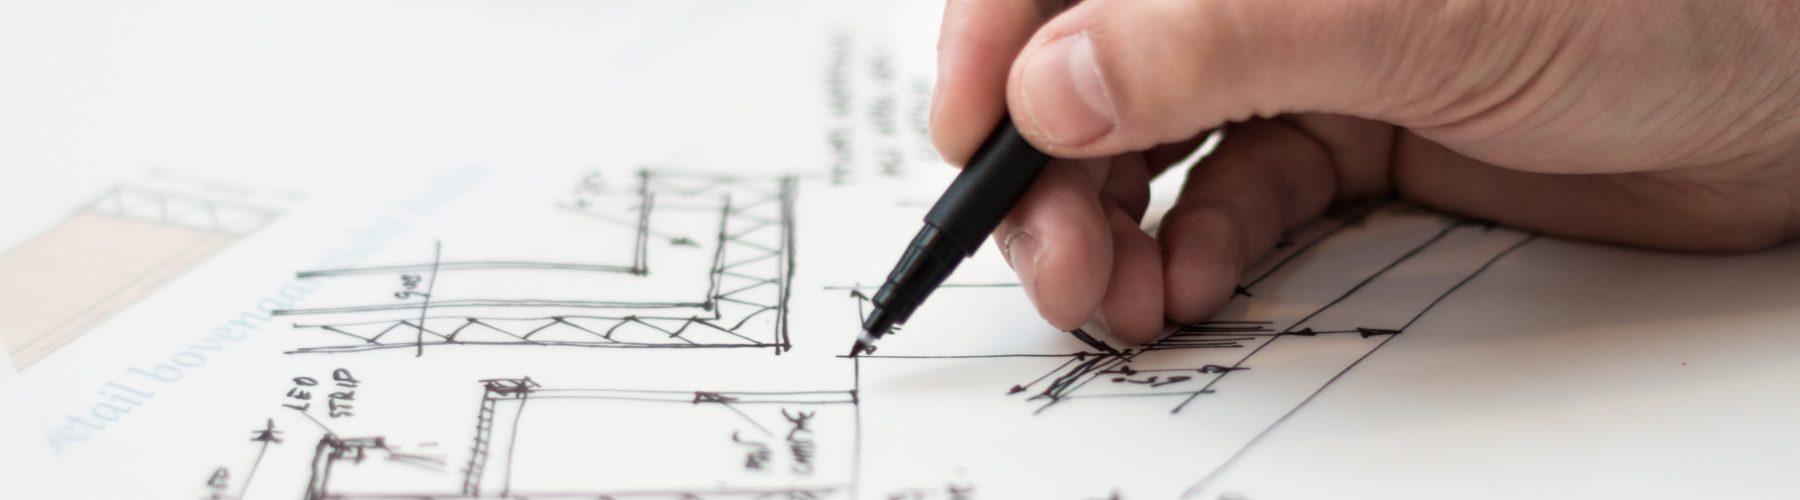 Building Regulations Applications